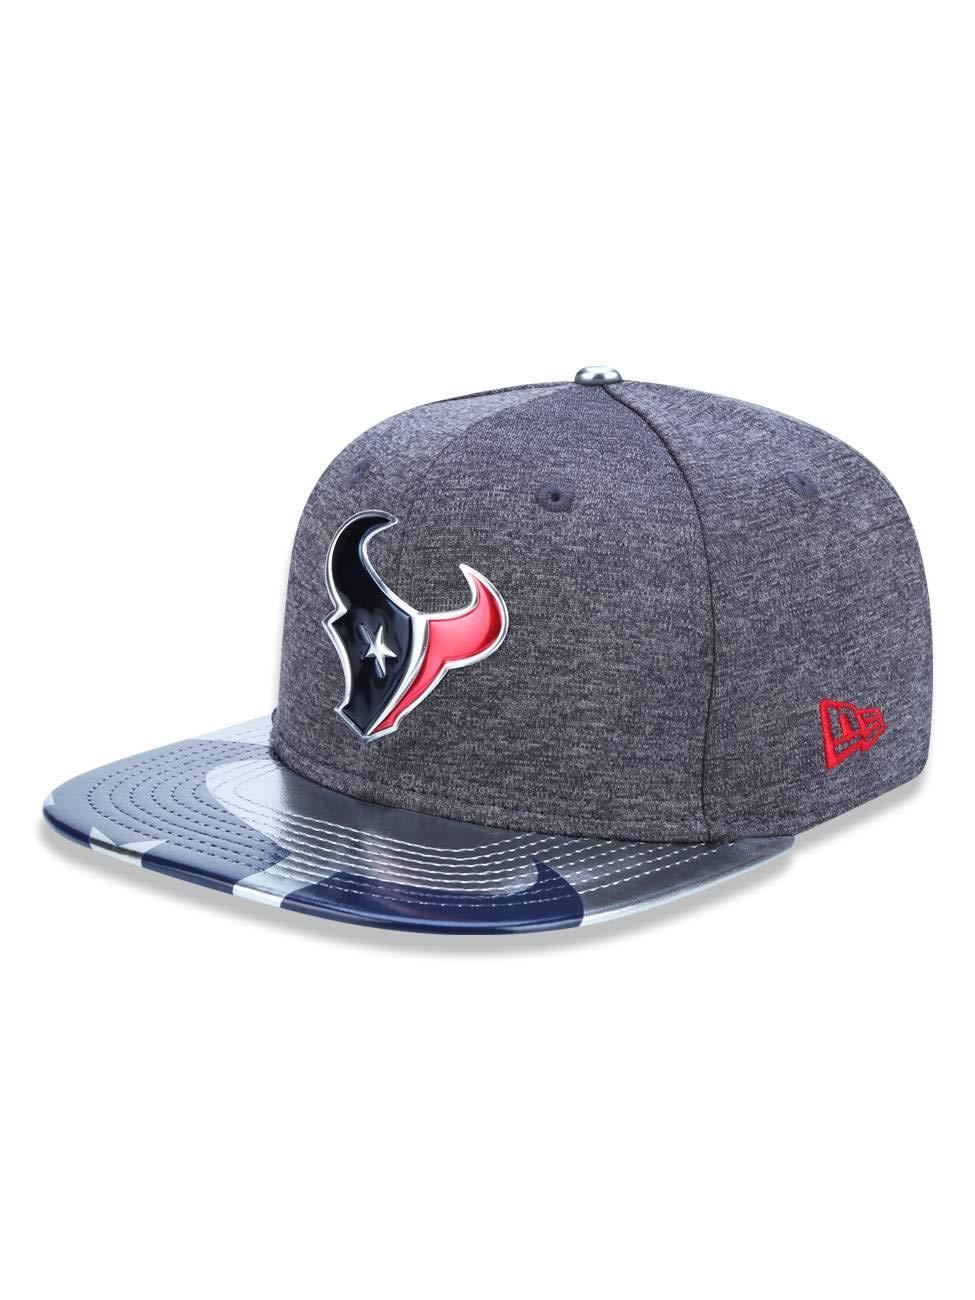 super popular aba29 0aeda NFL 2017ドラフトスポットライト9 Fiftyスナップバックキャップ B01M6ADAD1 One Size 黒鉛 Houston Texans  One Size 黒鉛-帽子キャップ. NEW ERA ...